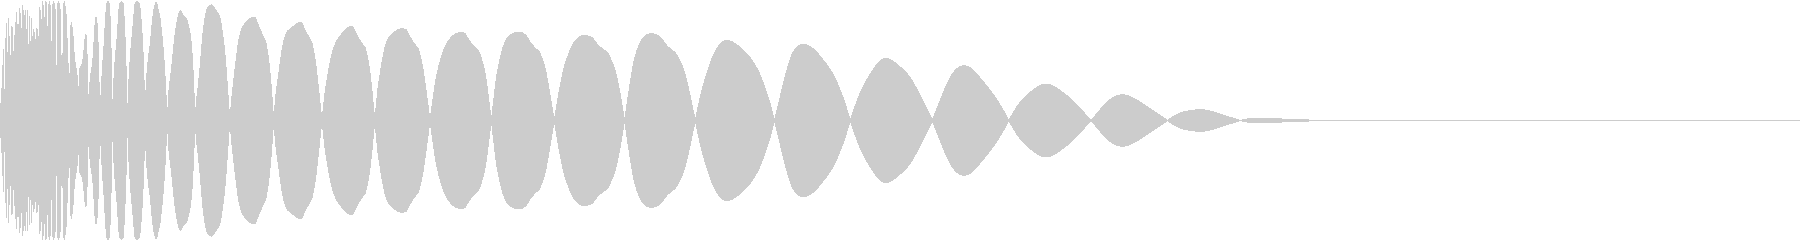 DTM Kick 58 オリジナル音源の未再生の波形